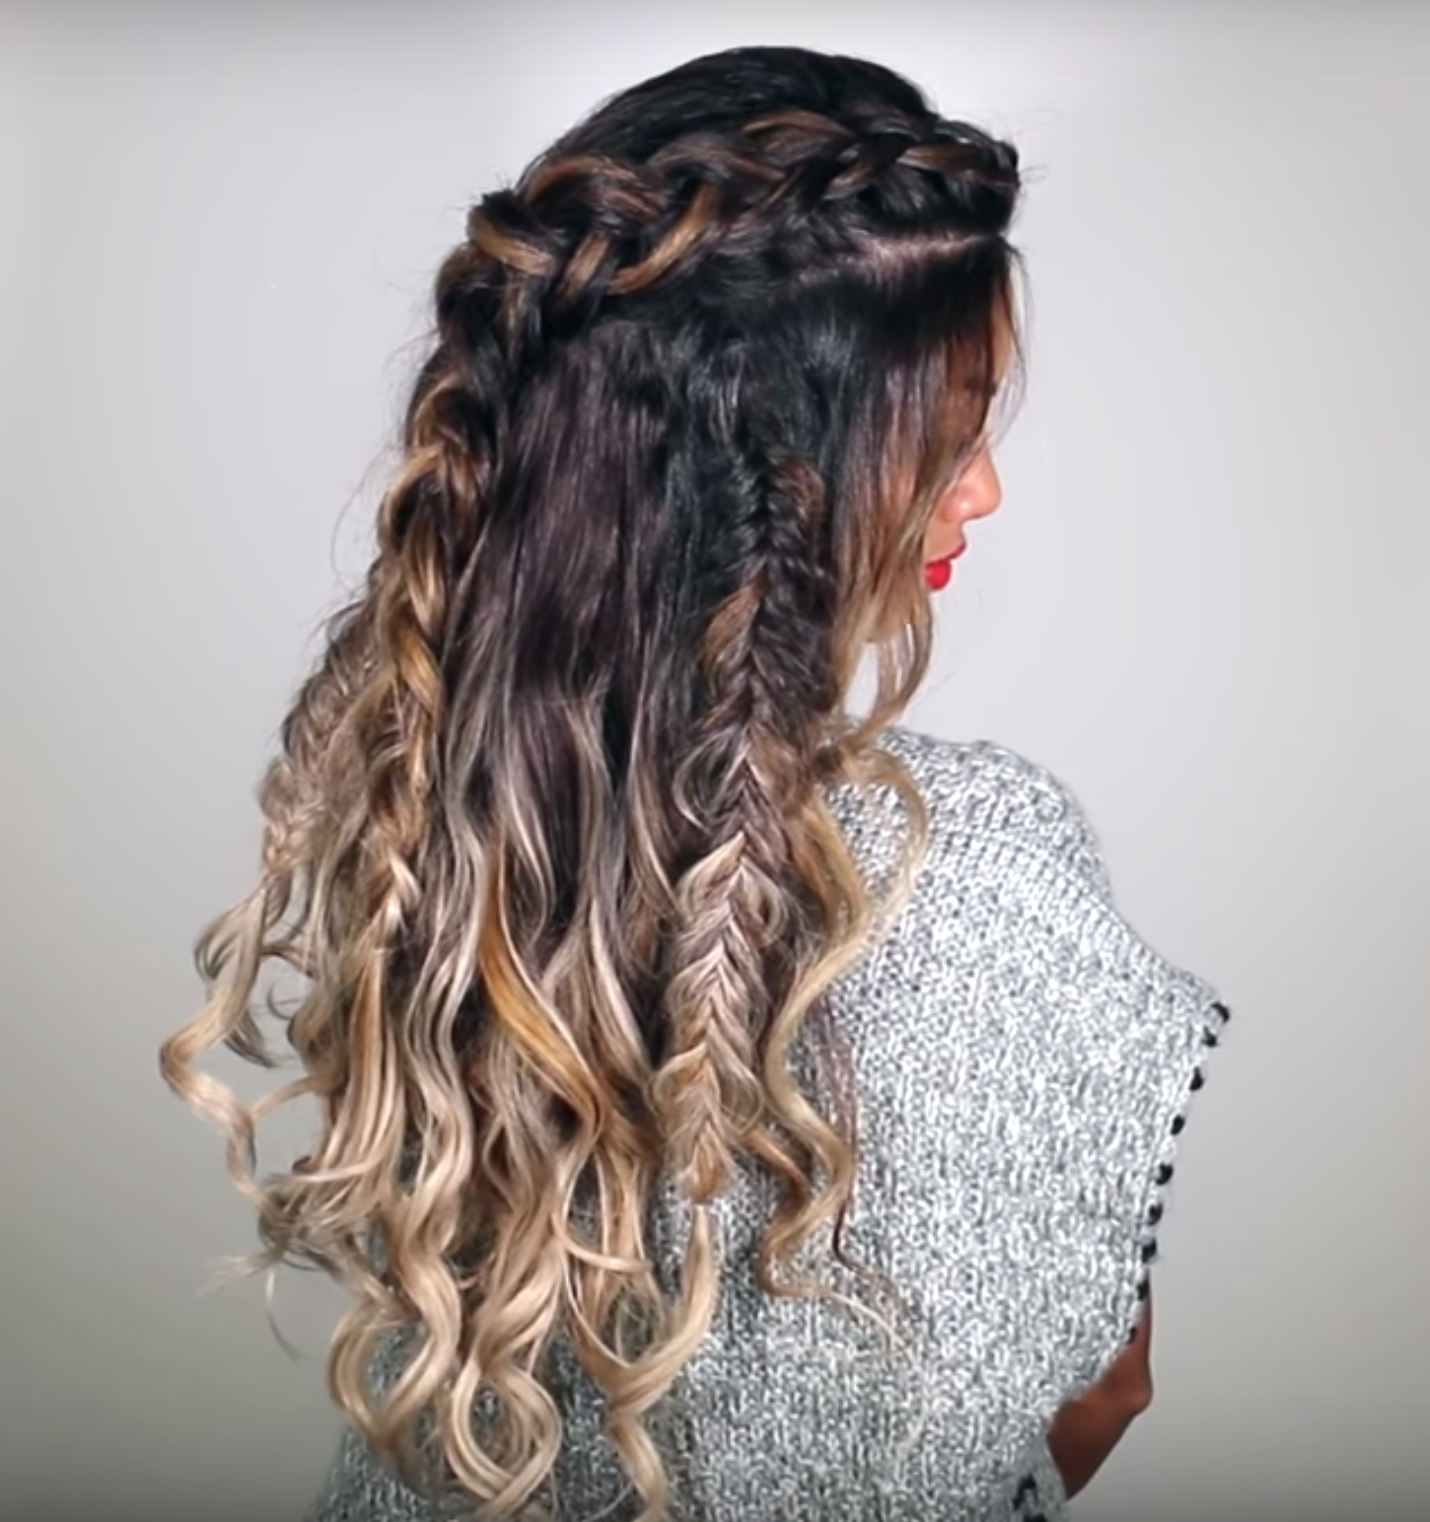 bohemian style 101: 3 easy boho hairstyles | beauty/hair